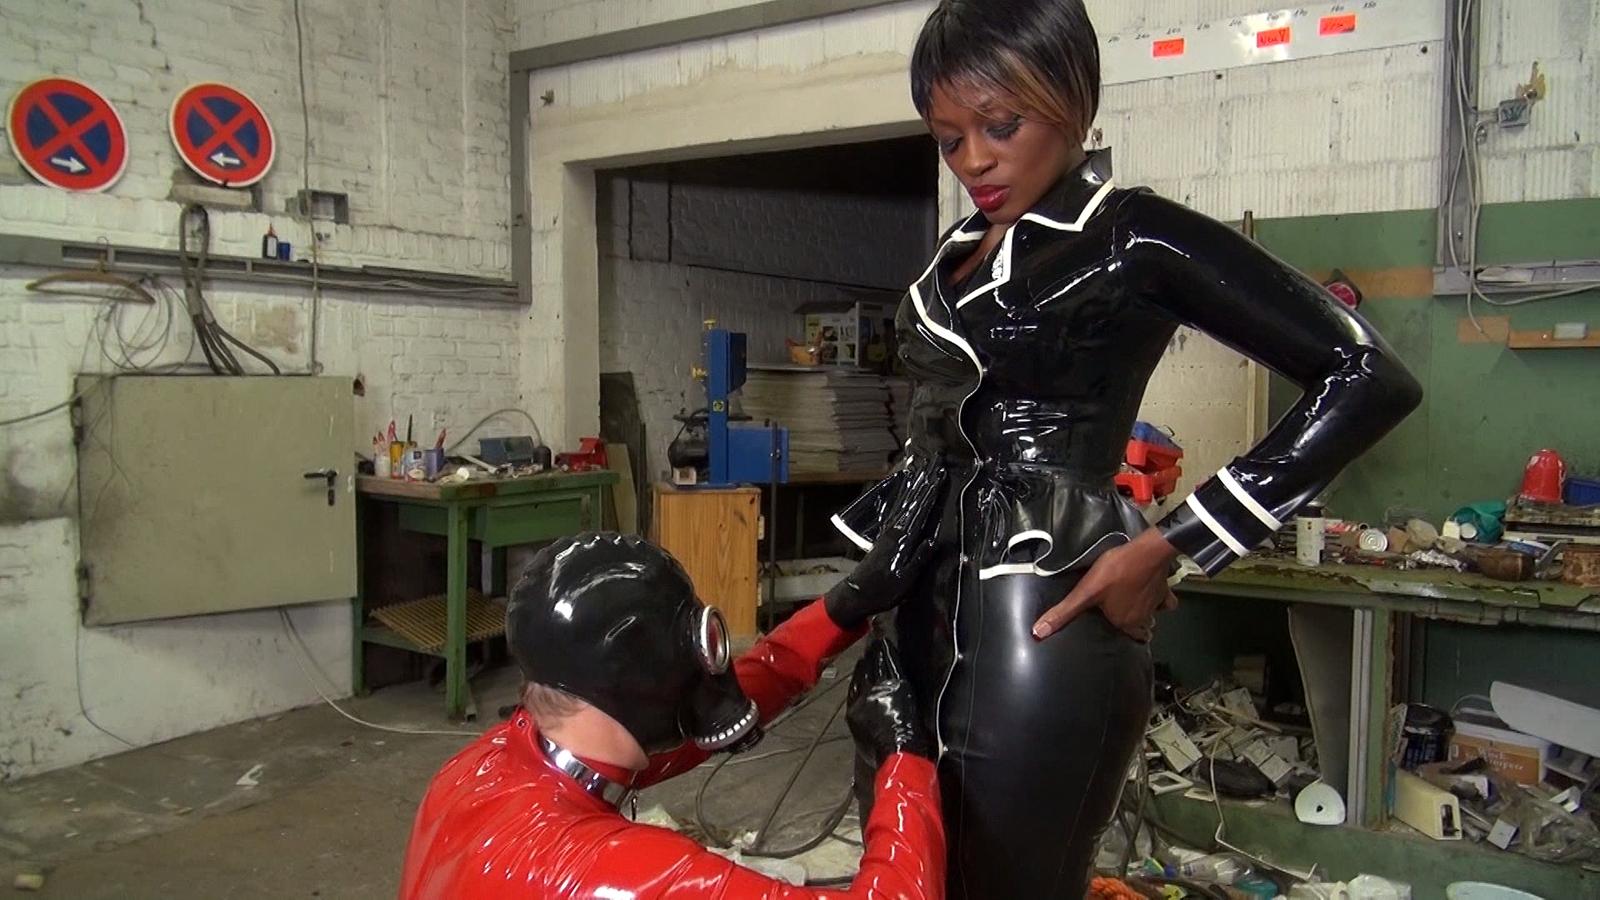 Gas mask cbt femdom mistress follow bondageland on twitter - 1 part 3